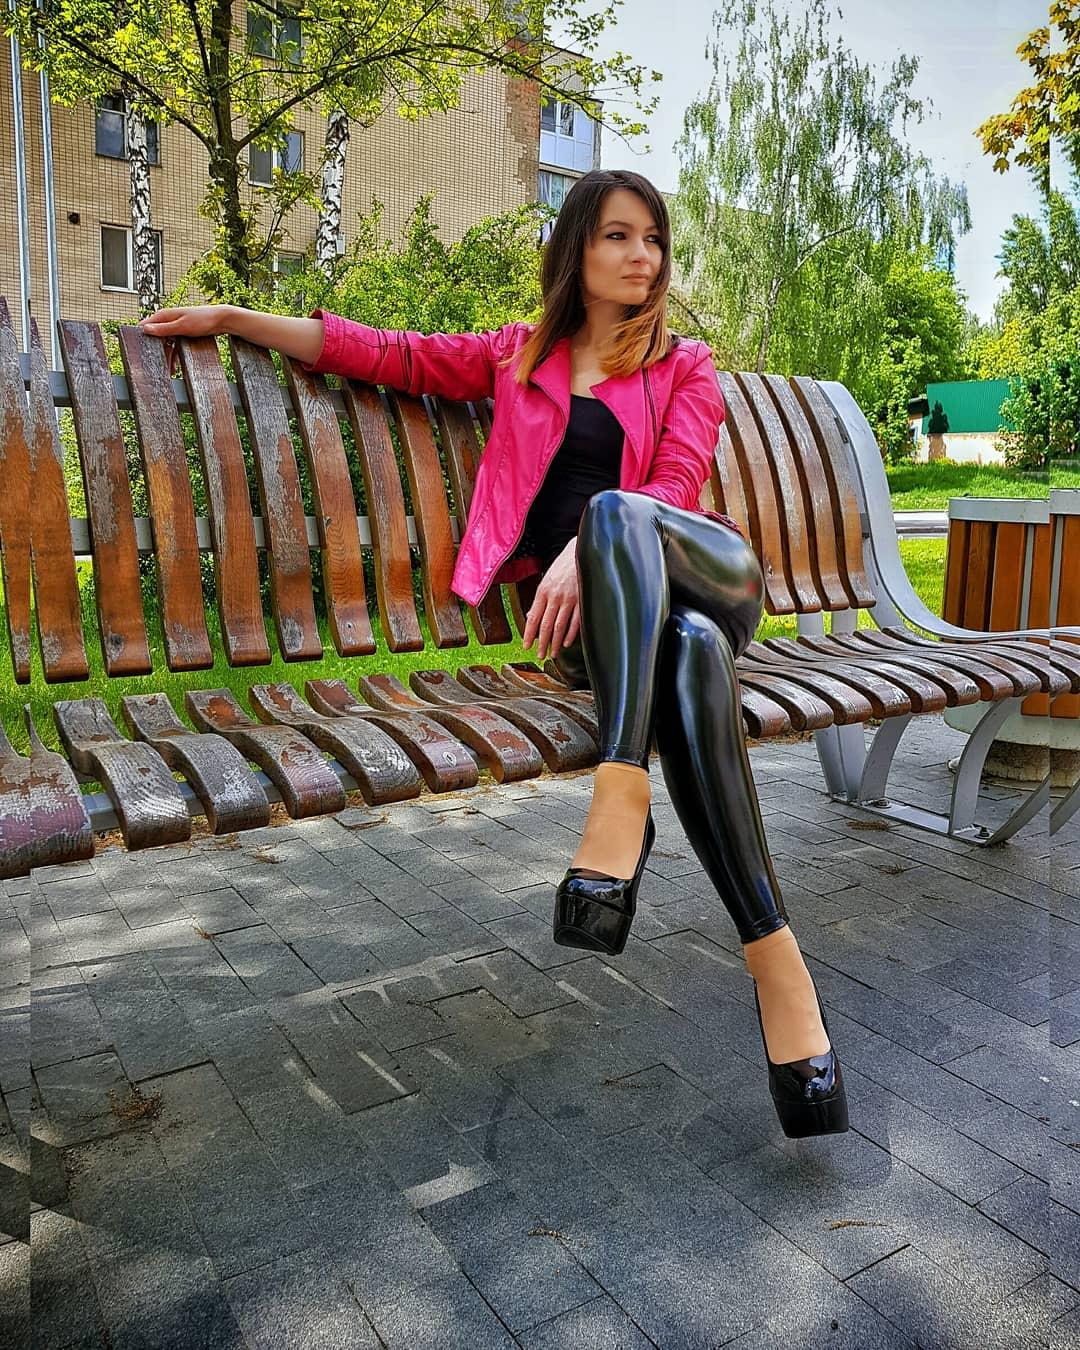 Olga-Madych-Wallpapers-Insta-Fit-Bio-6